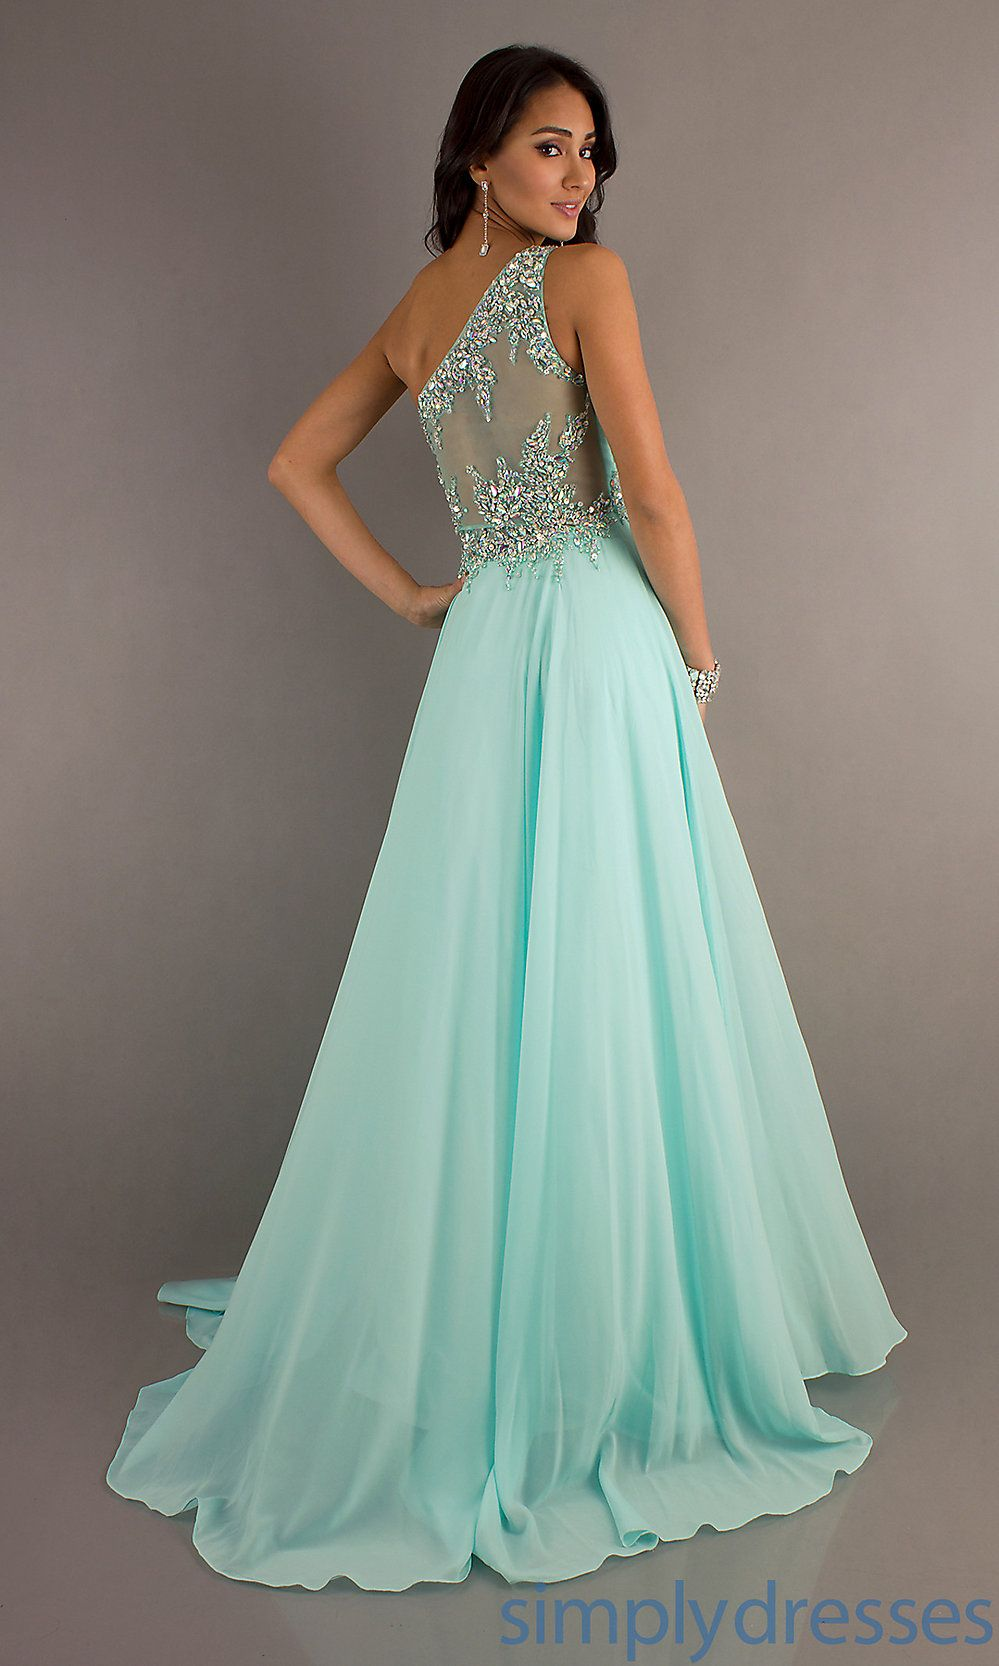 Prom Dress Tiffany Prom Catalog